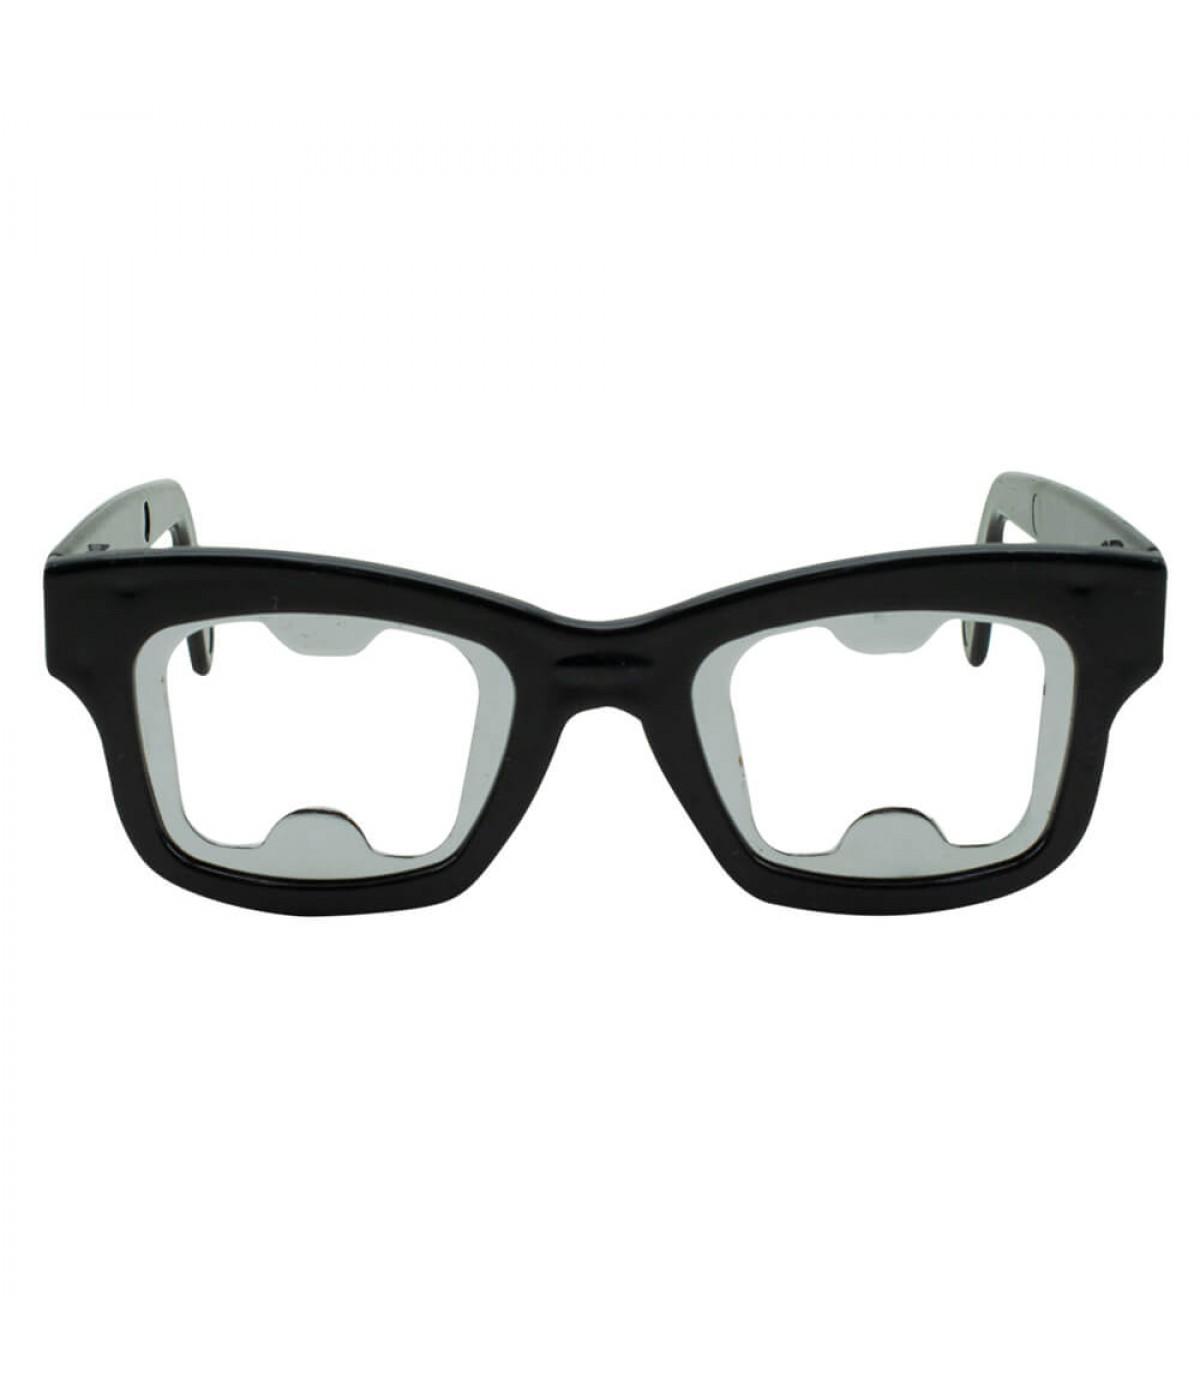 Óculos Preto Abridor Garrafas 4.5x15x14cm